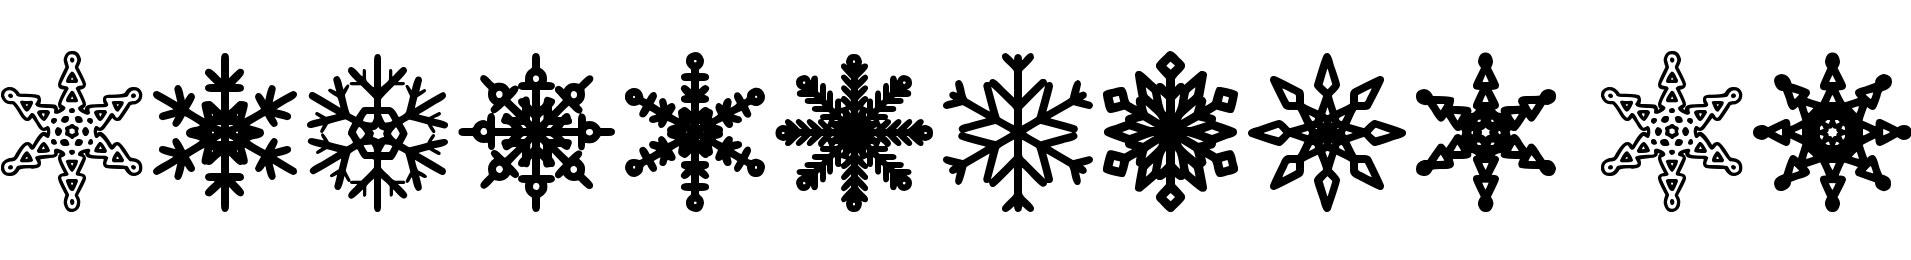 Snowflakes St